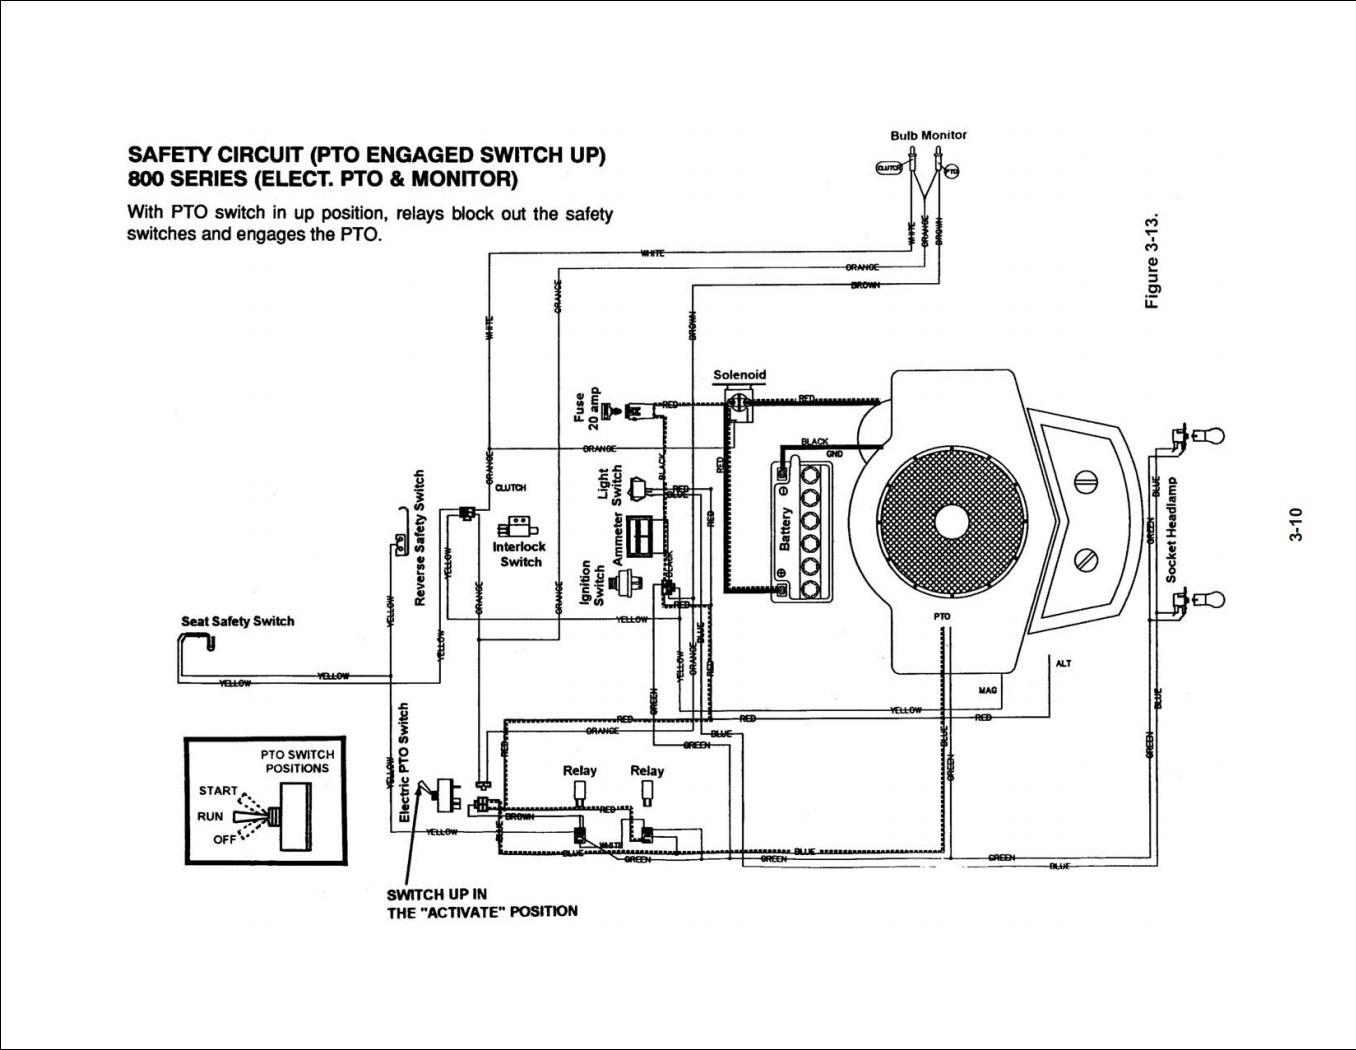 10 Hp Briggs Parts Diagram Wiring Schematic | Wiring Diagram - Briggs And Stratton 18 Hp Twin Wiring Diagram